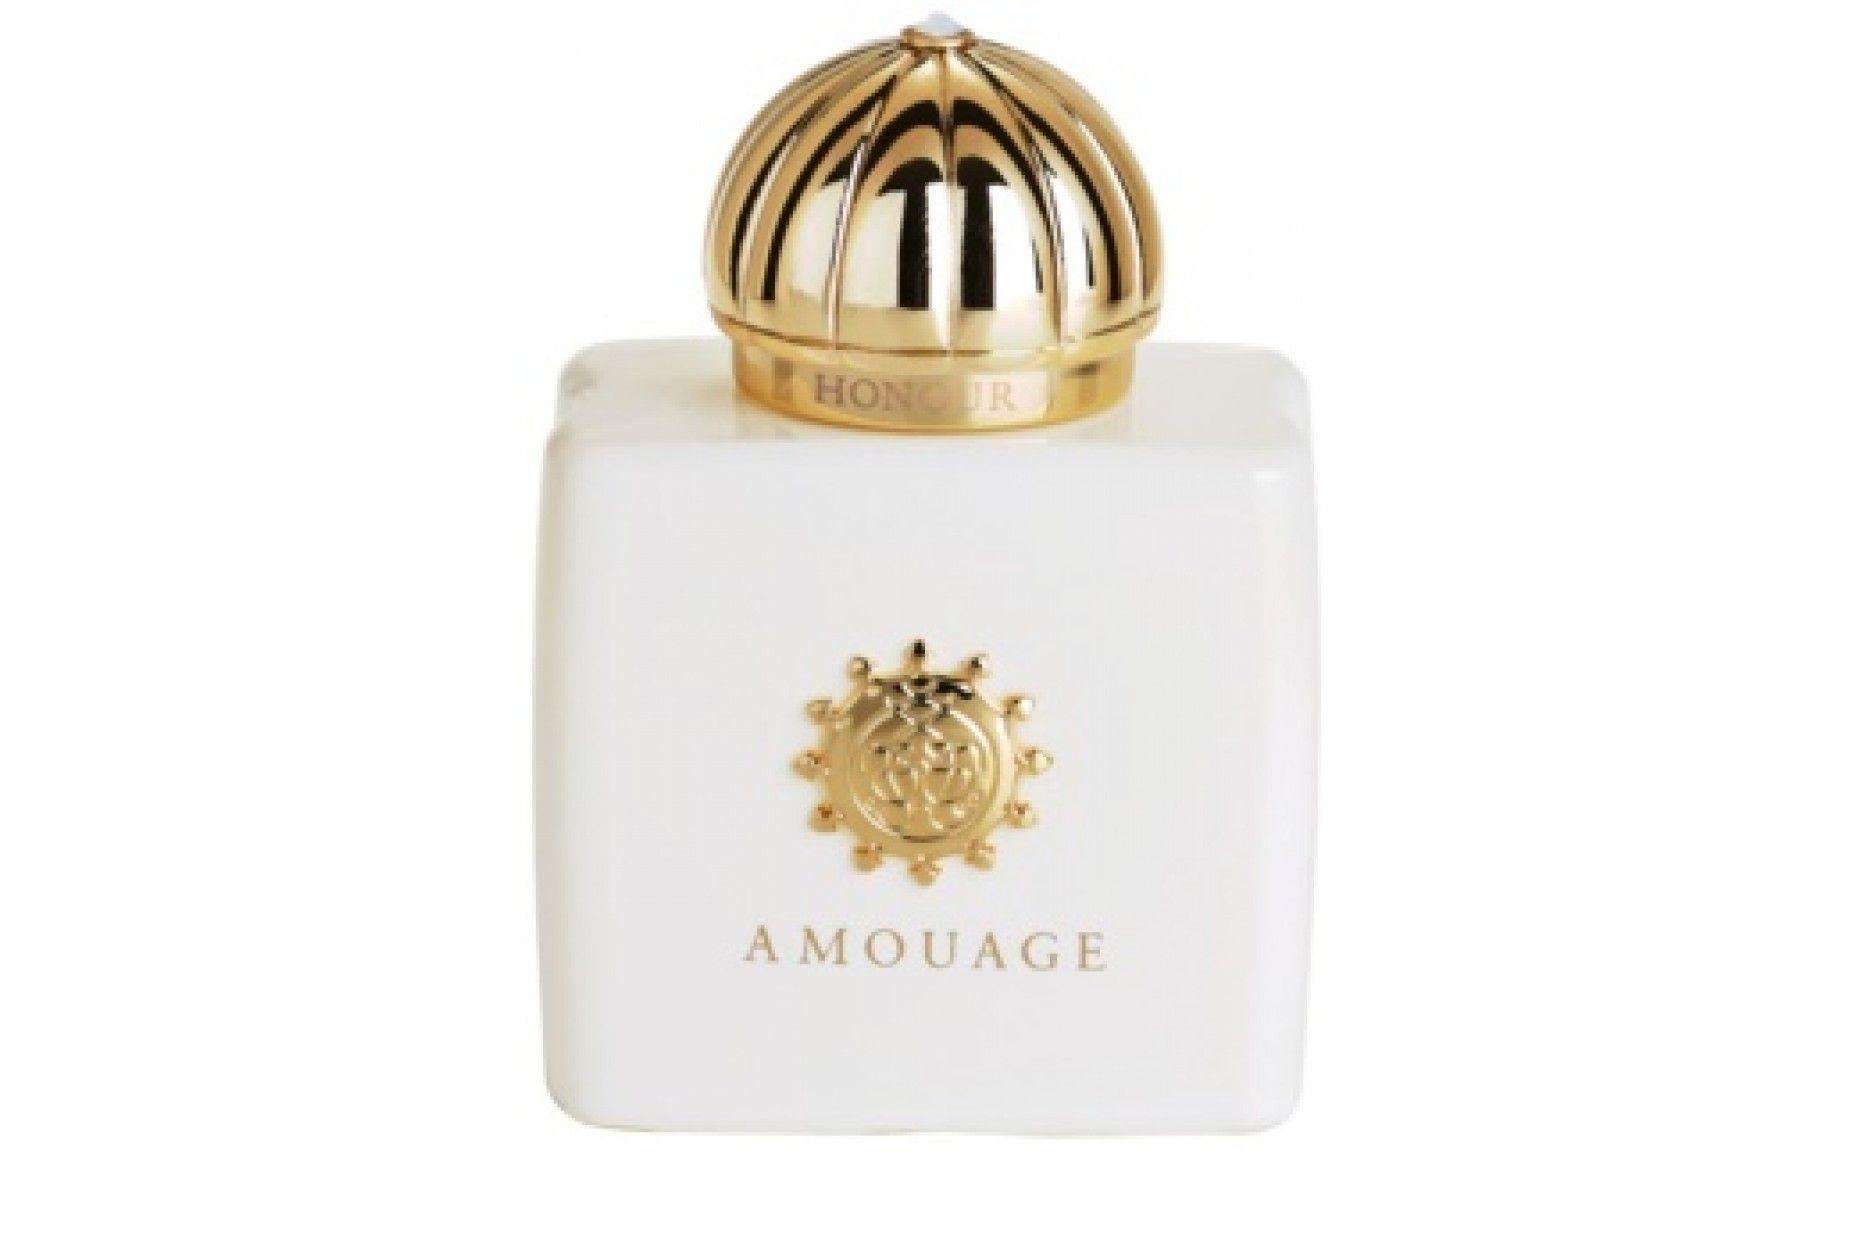 عطر امواج الابيض للنساء Perfume Bottles Amouage Perfume